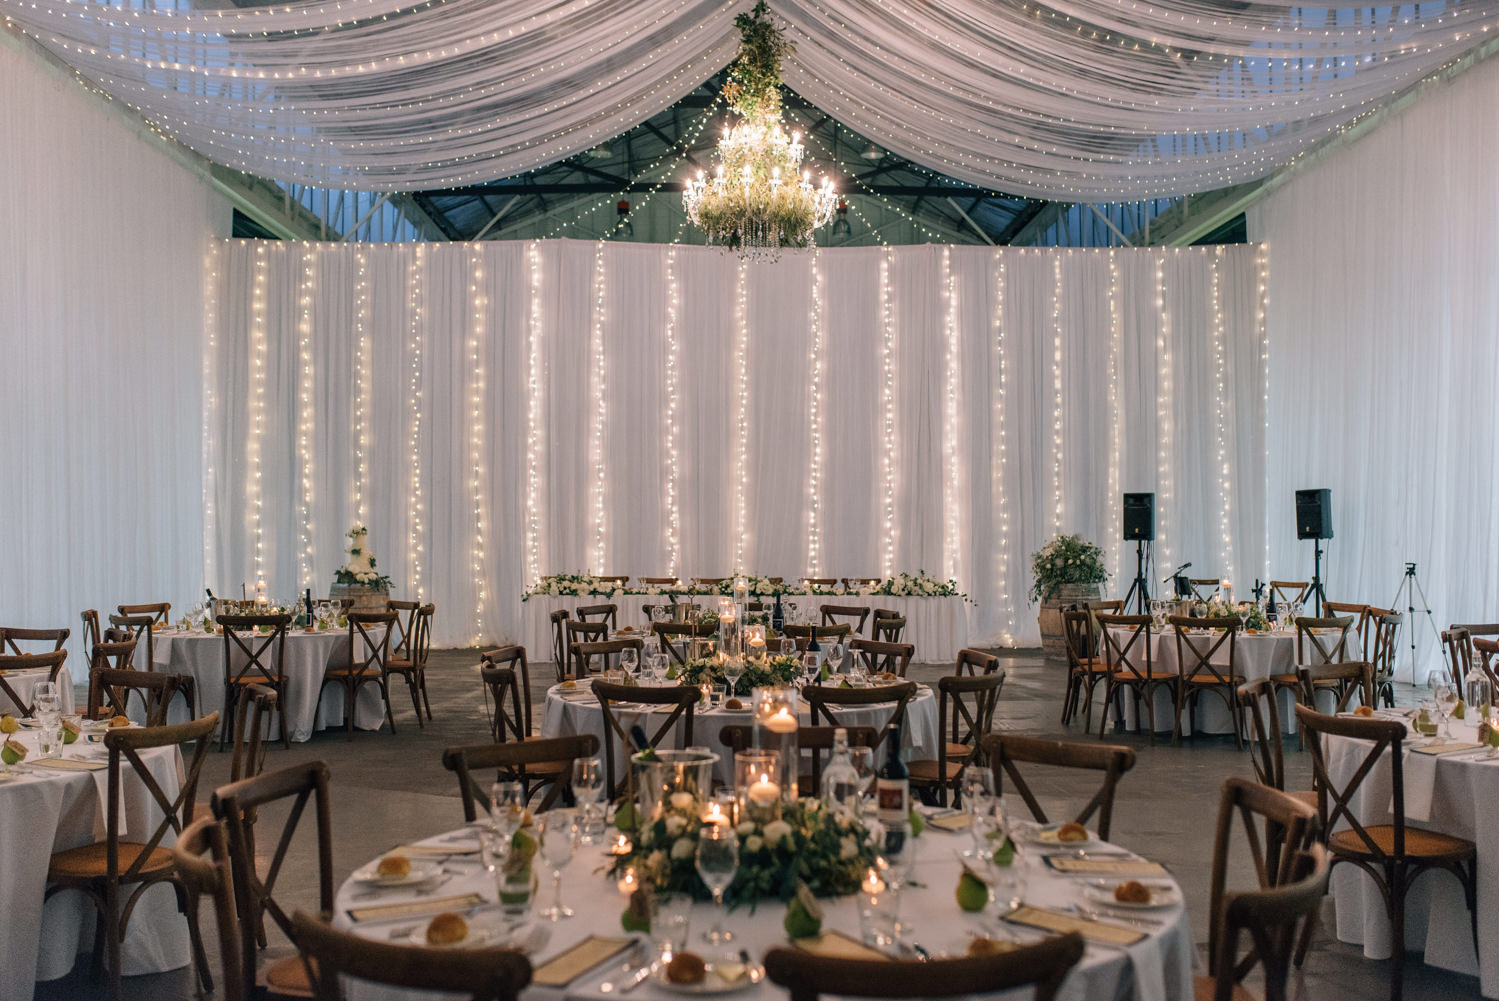 Entally-House-Wedding-Photographer-92.jpg